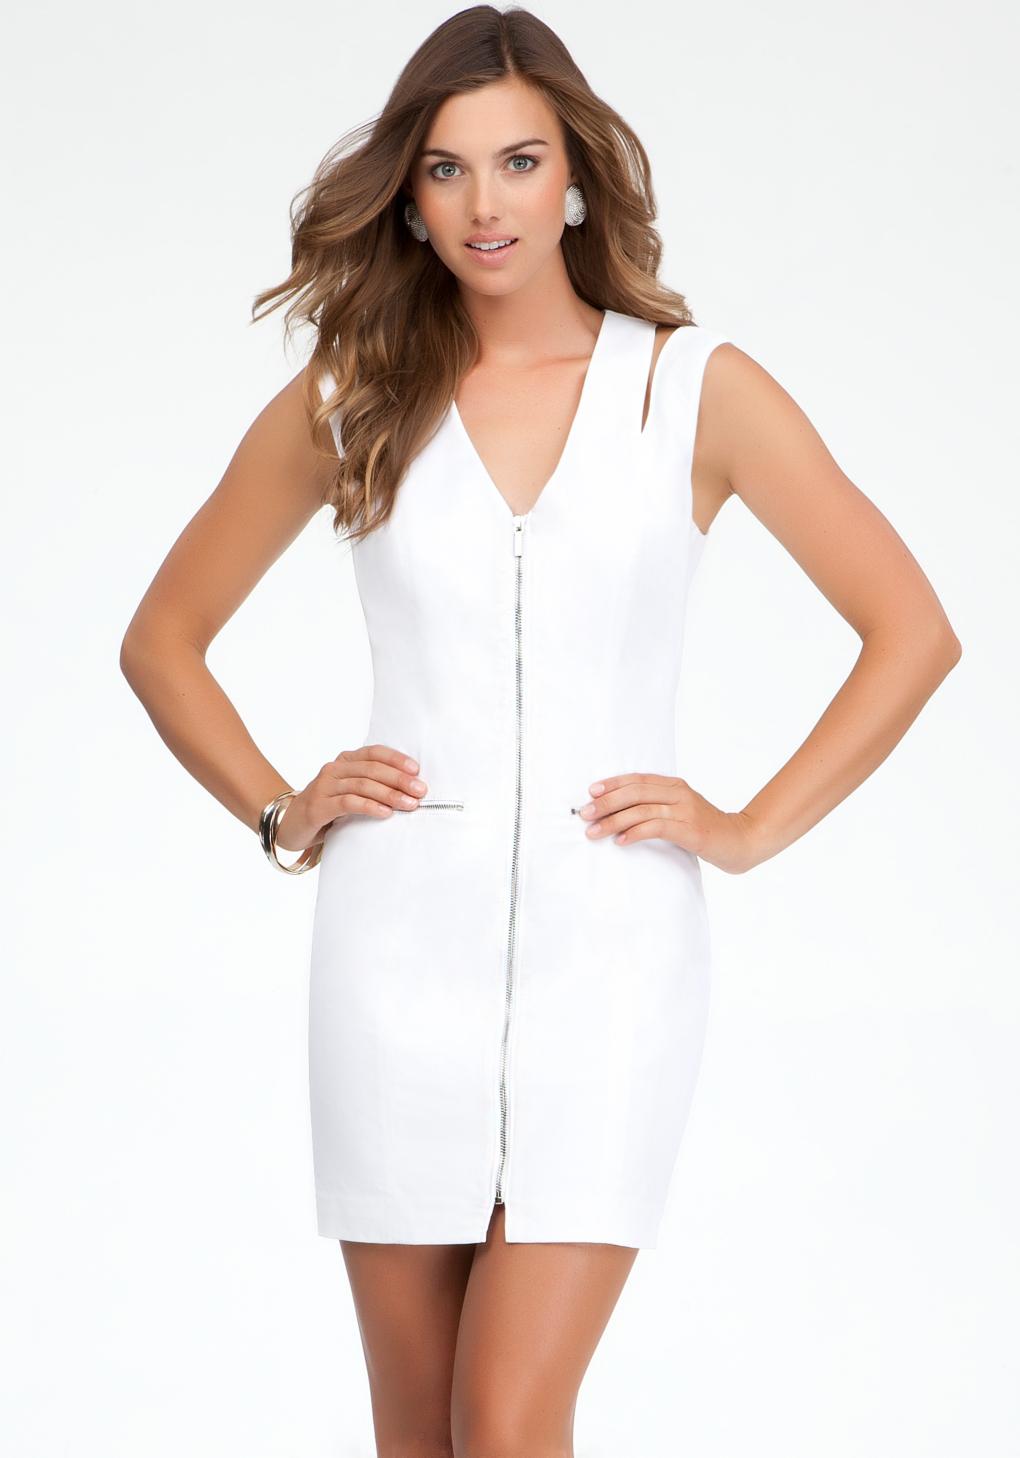 Full Front Zipper Dress - Dress Foto and